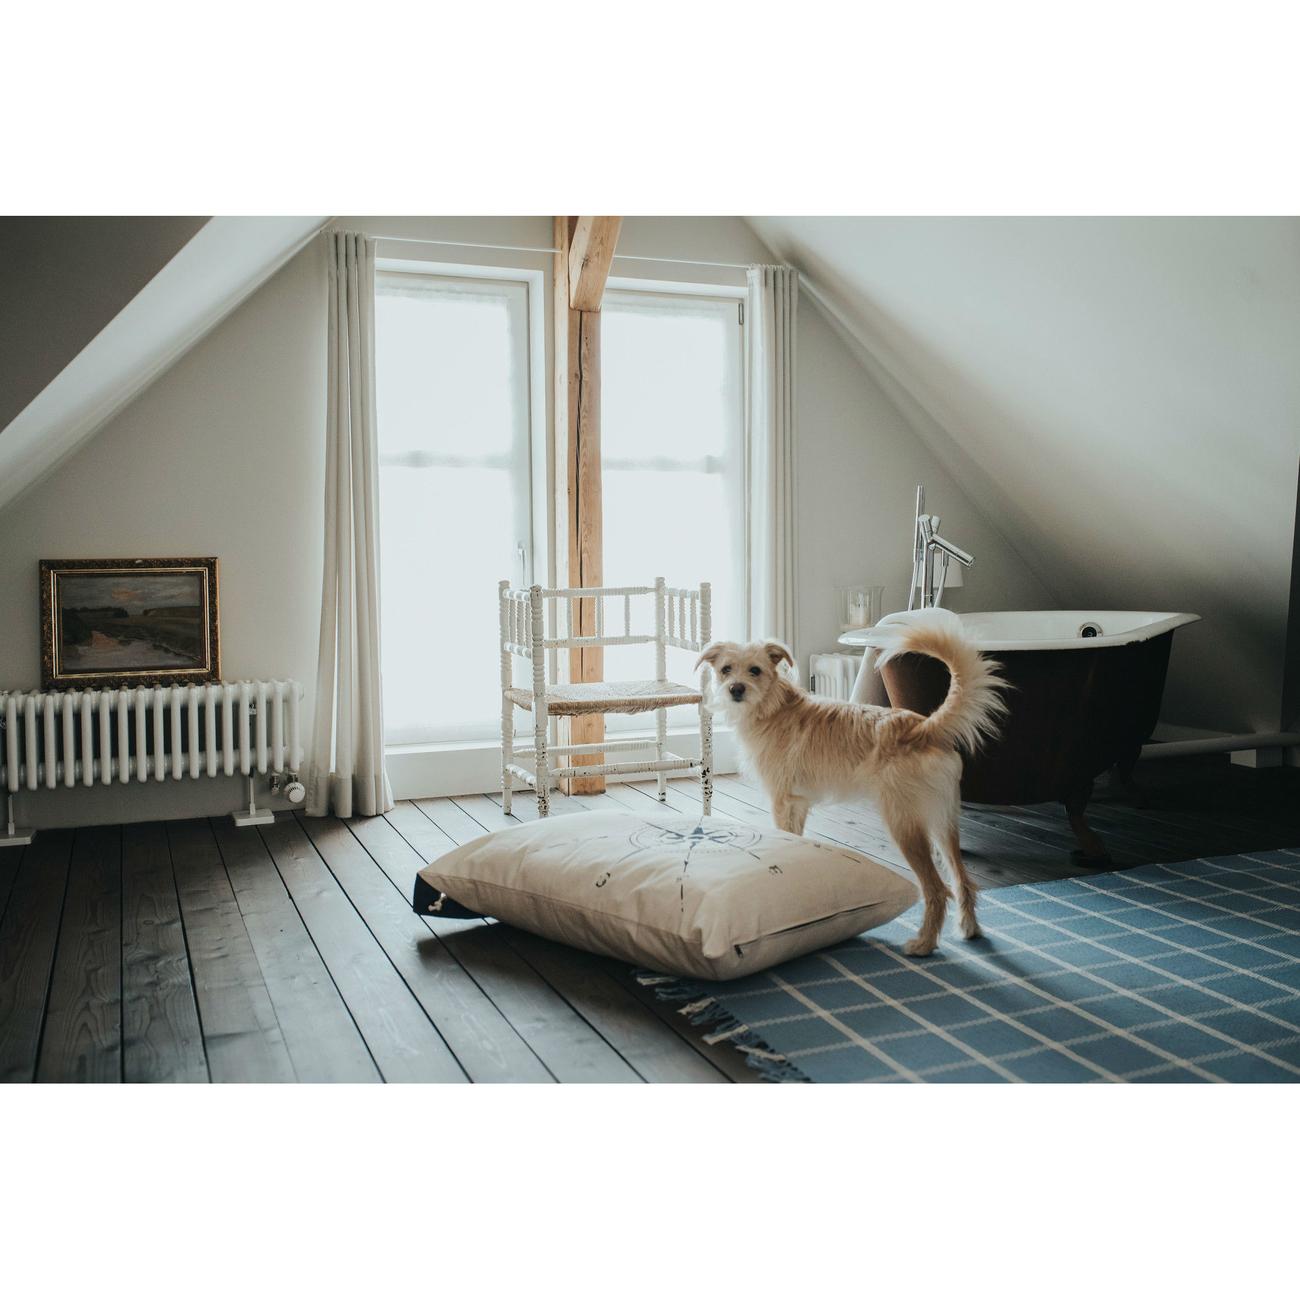 Hunter Hundekissen List 63953, Bild 6